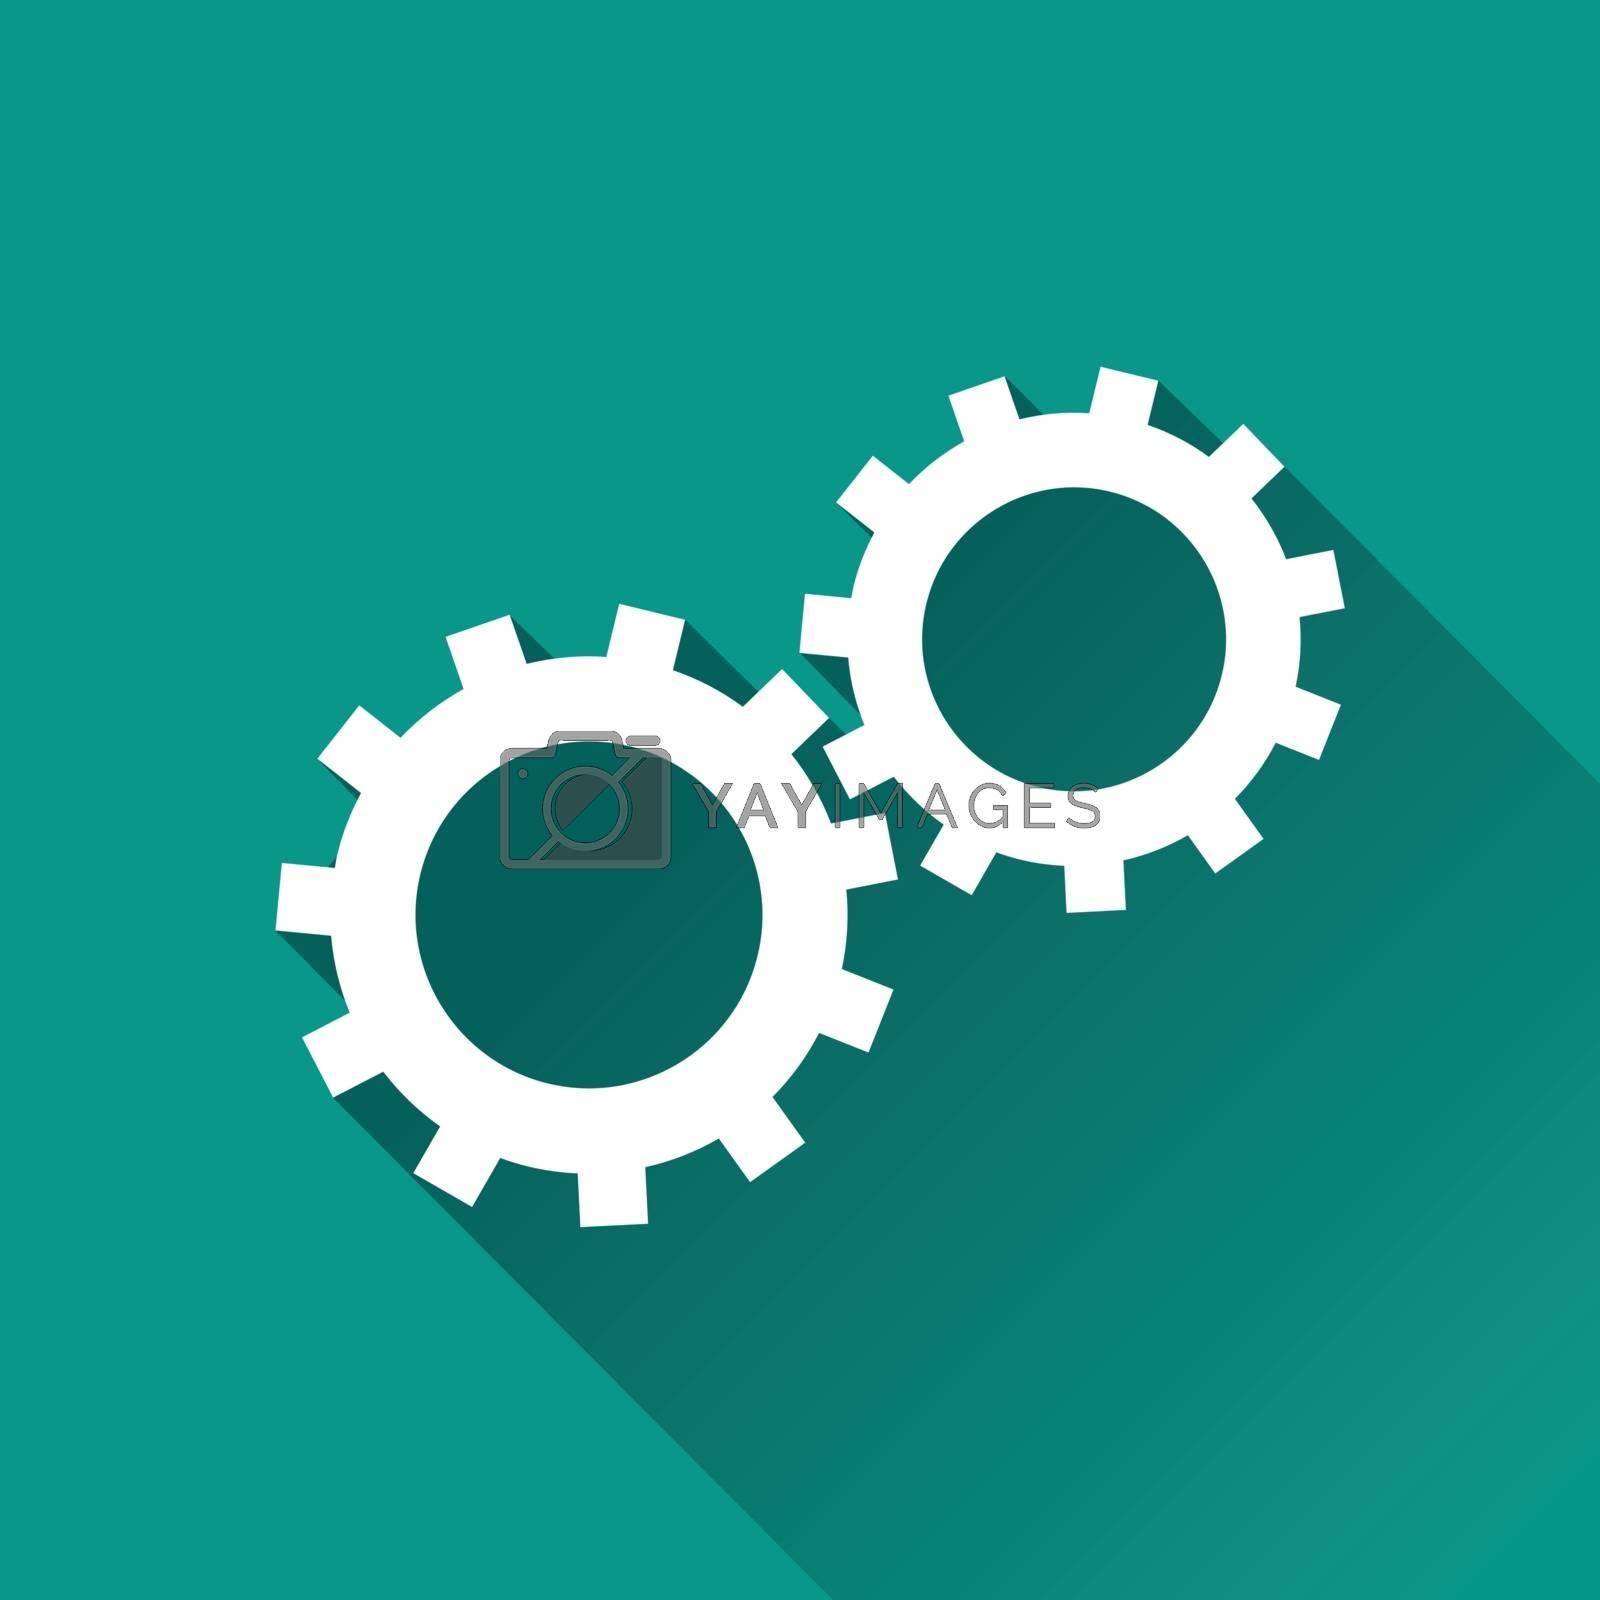 gears flat design icon by nickylarson974